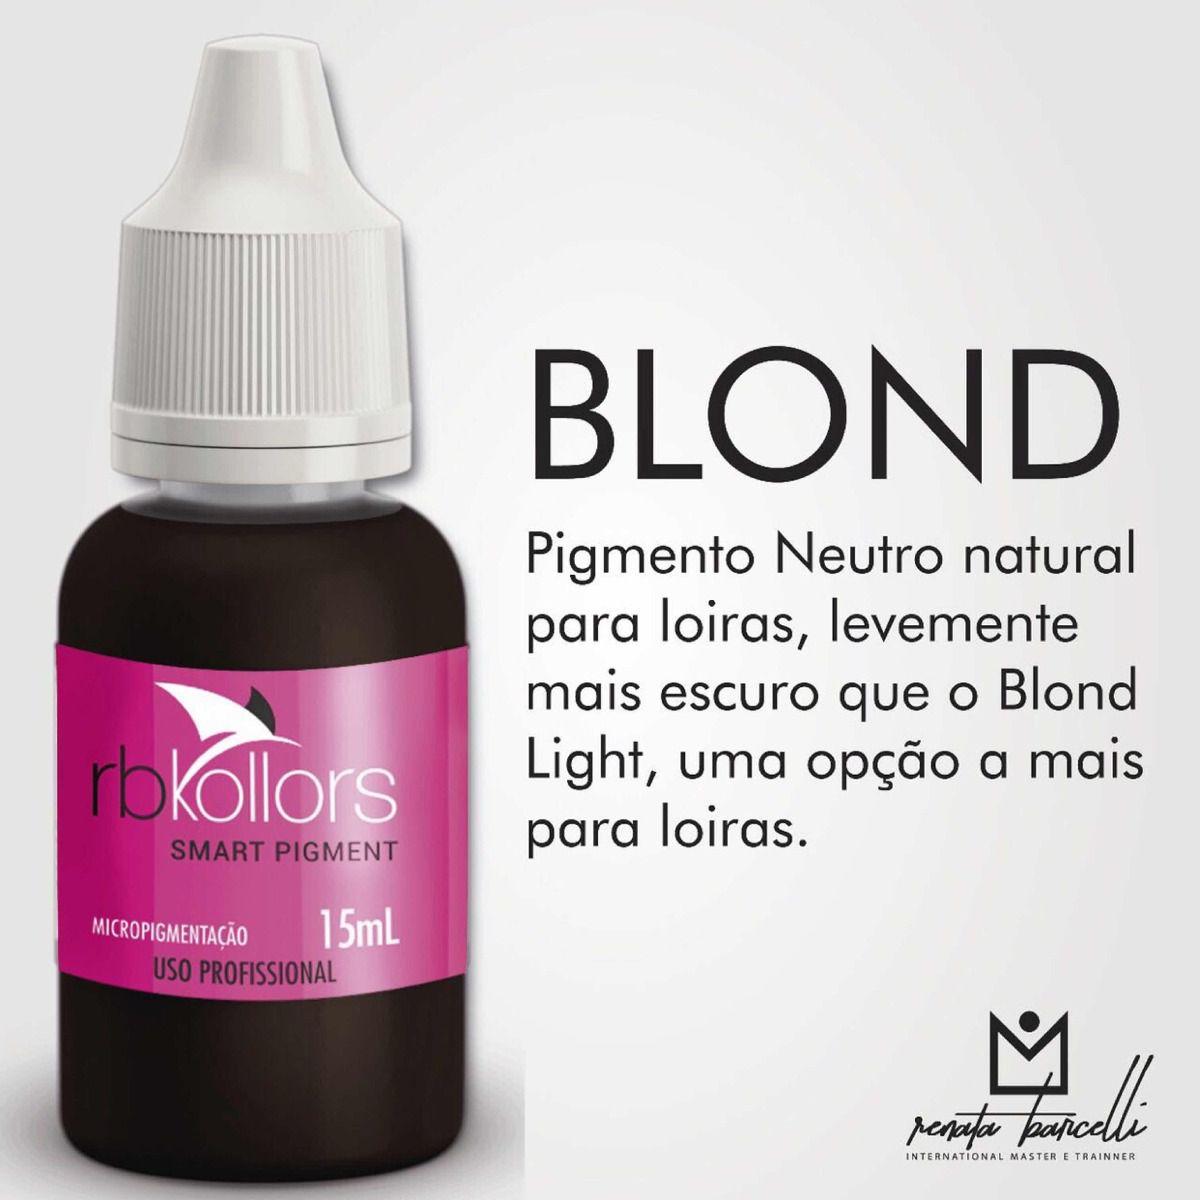 Pigmento orgânico RB Kollors 15 ml - Blond  - Tebori Nordeste